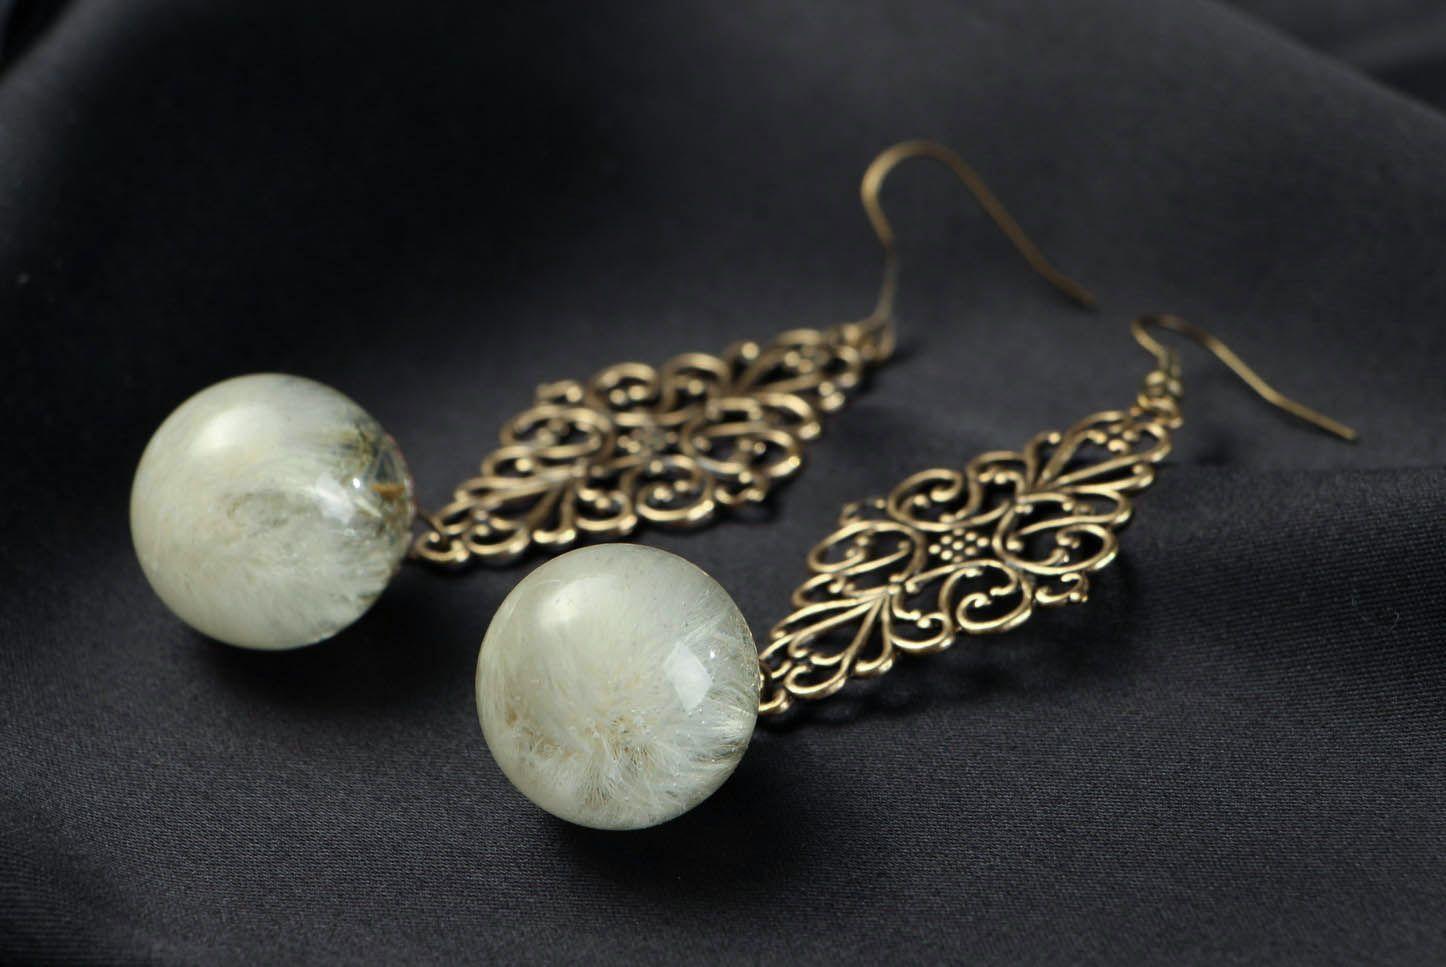 Long Earrings with Dandelions photo 2